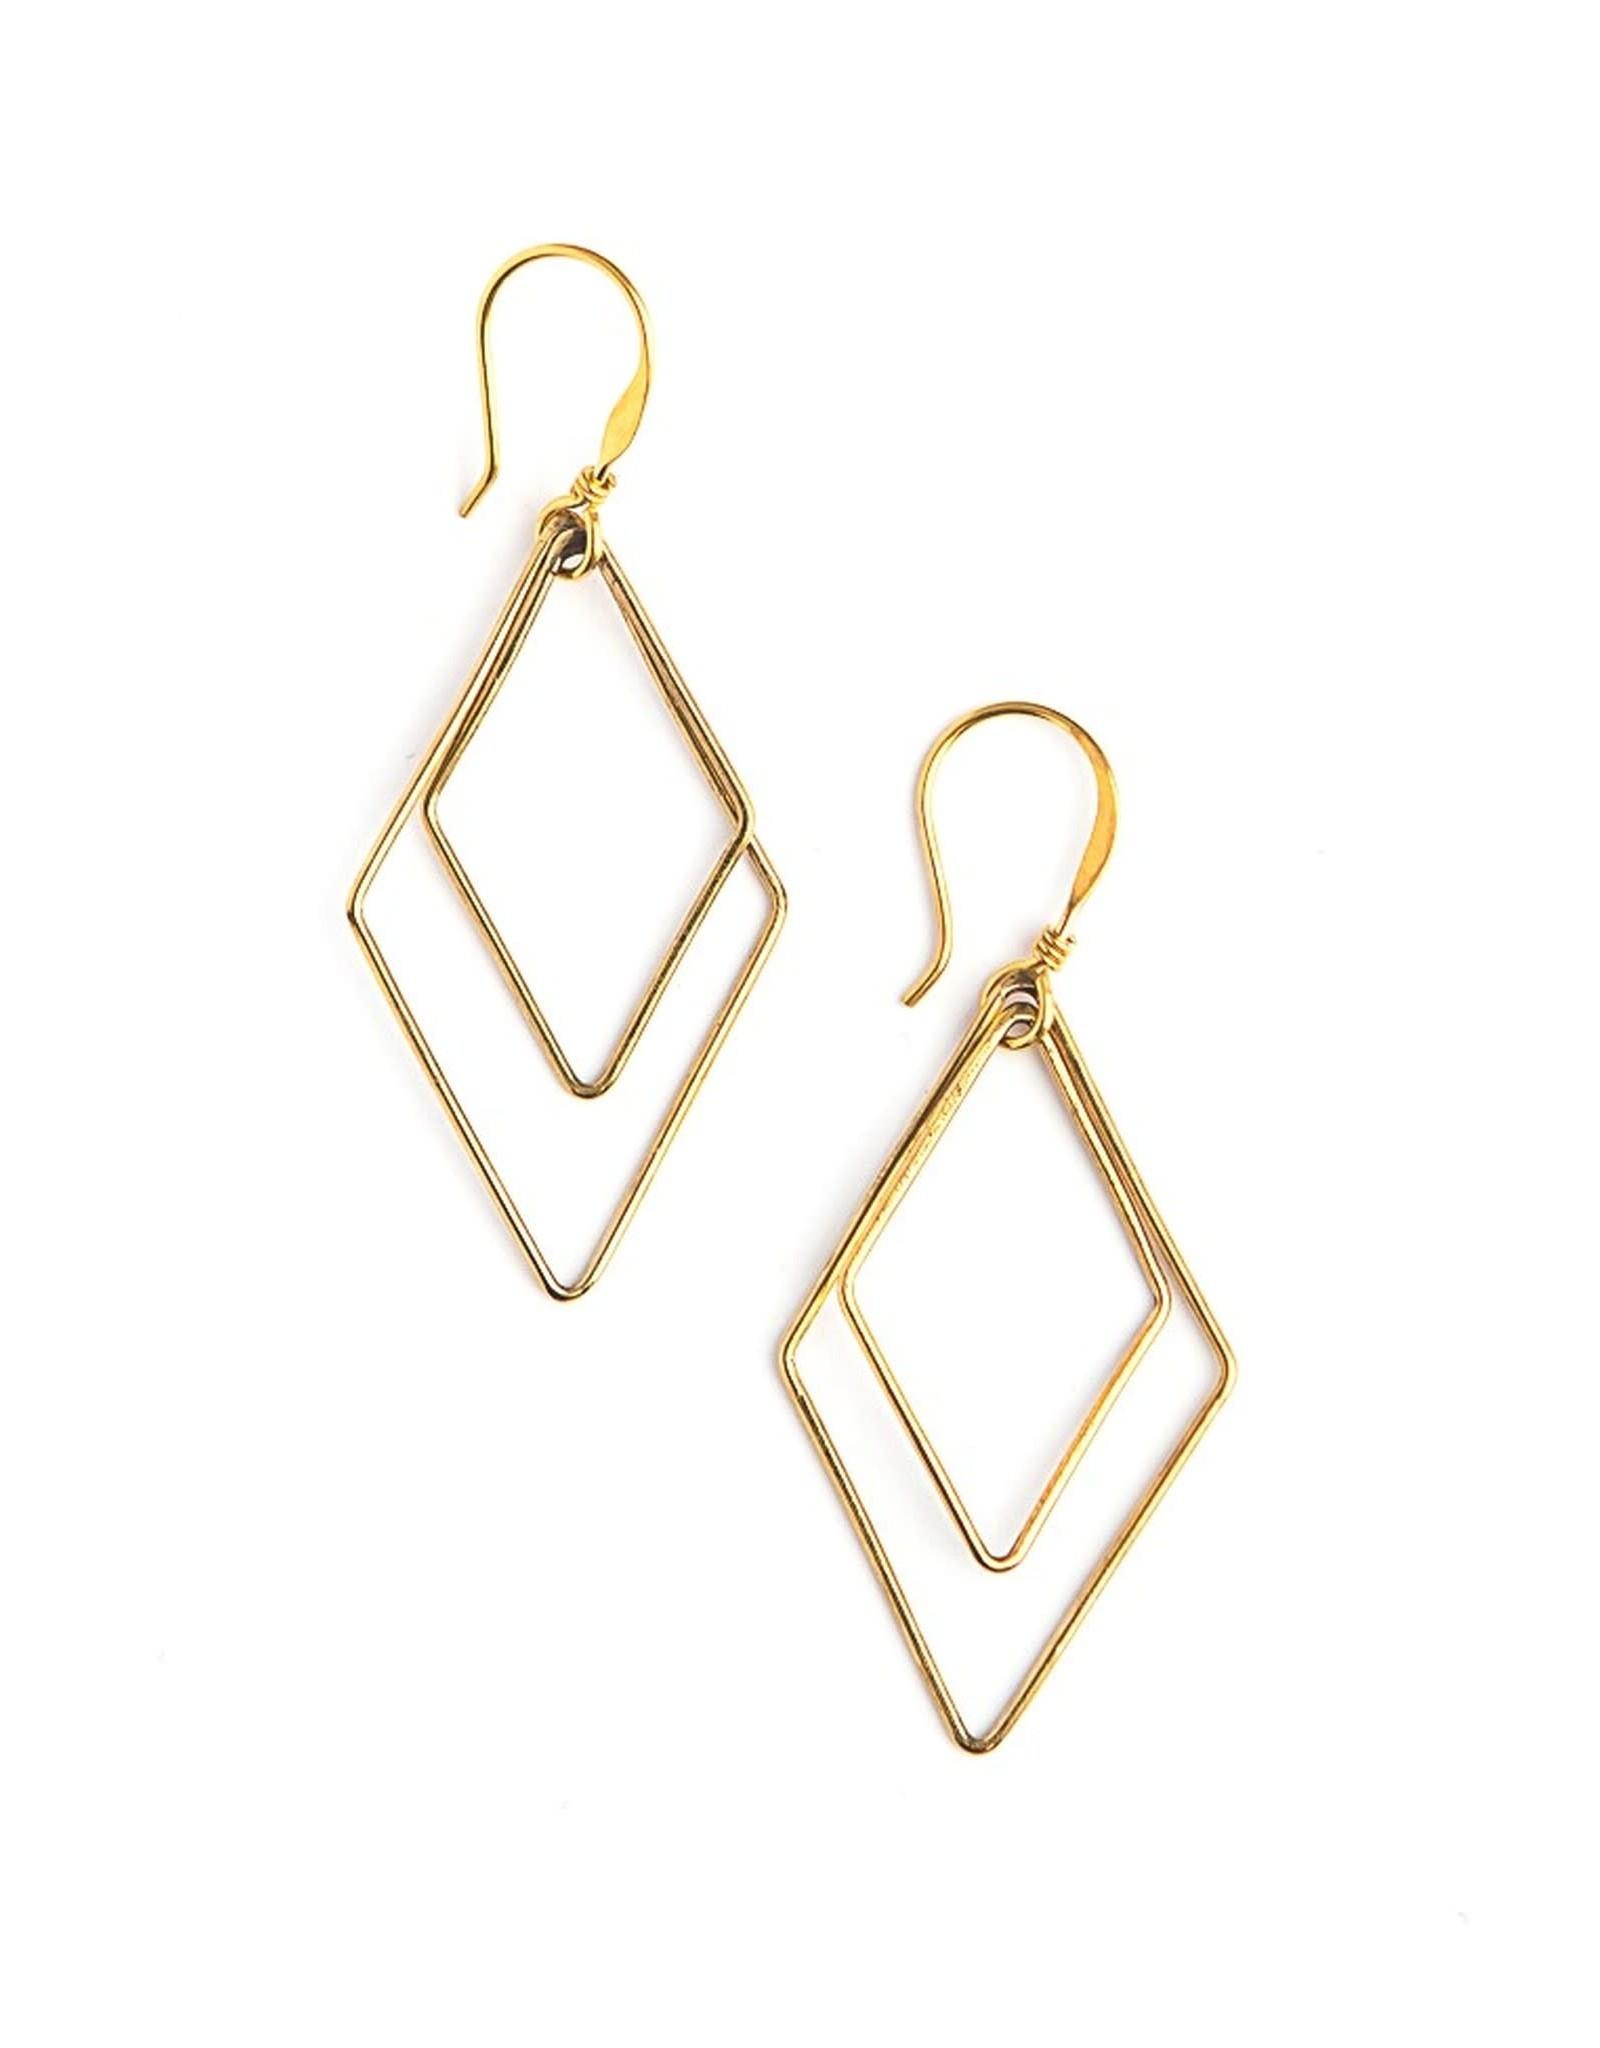 Rhombus Earrings Gold, Mexico